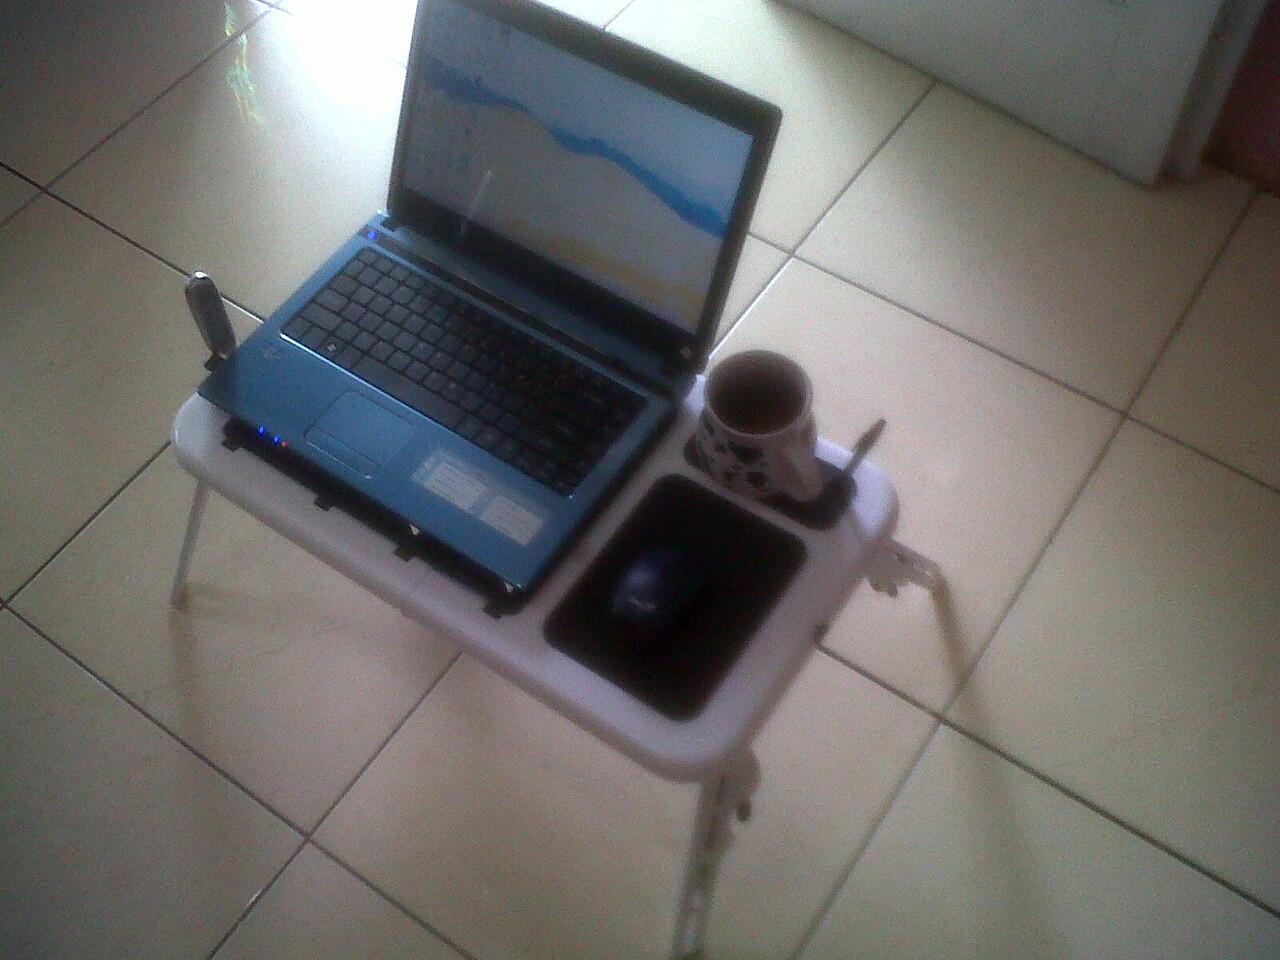 Terjual Cuci Gudang Meja Laptop Portable Murah Bandung Cuman 115rb